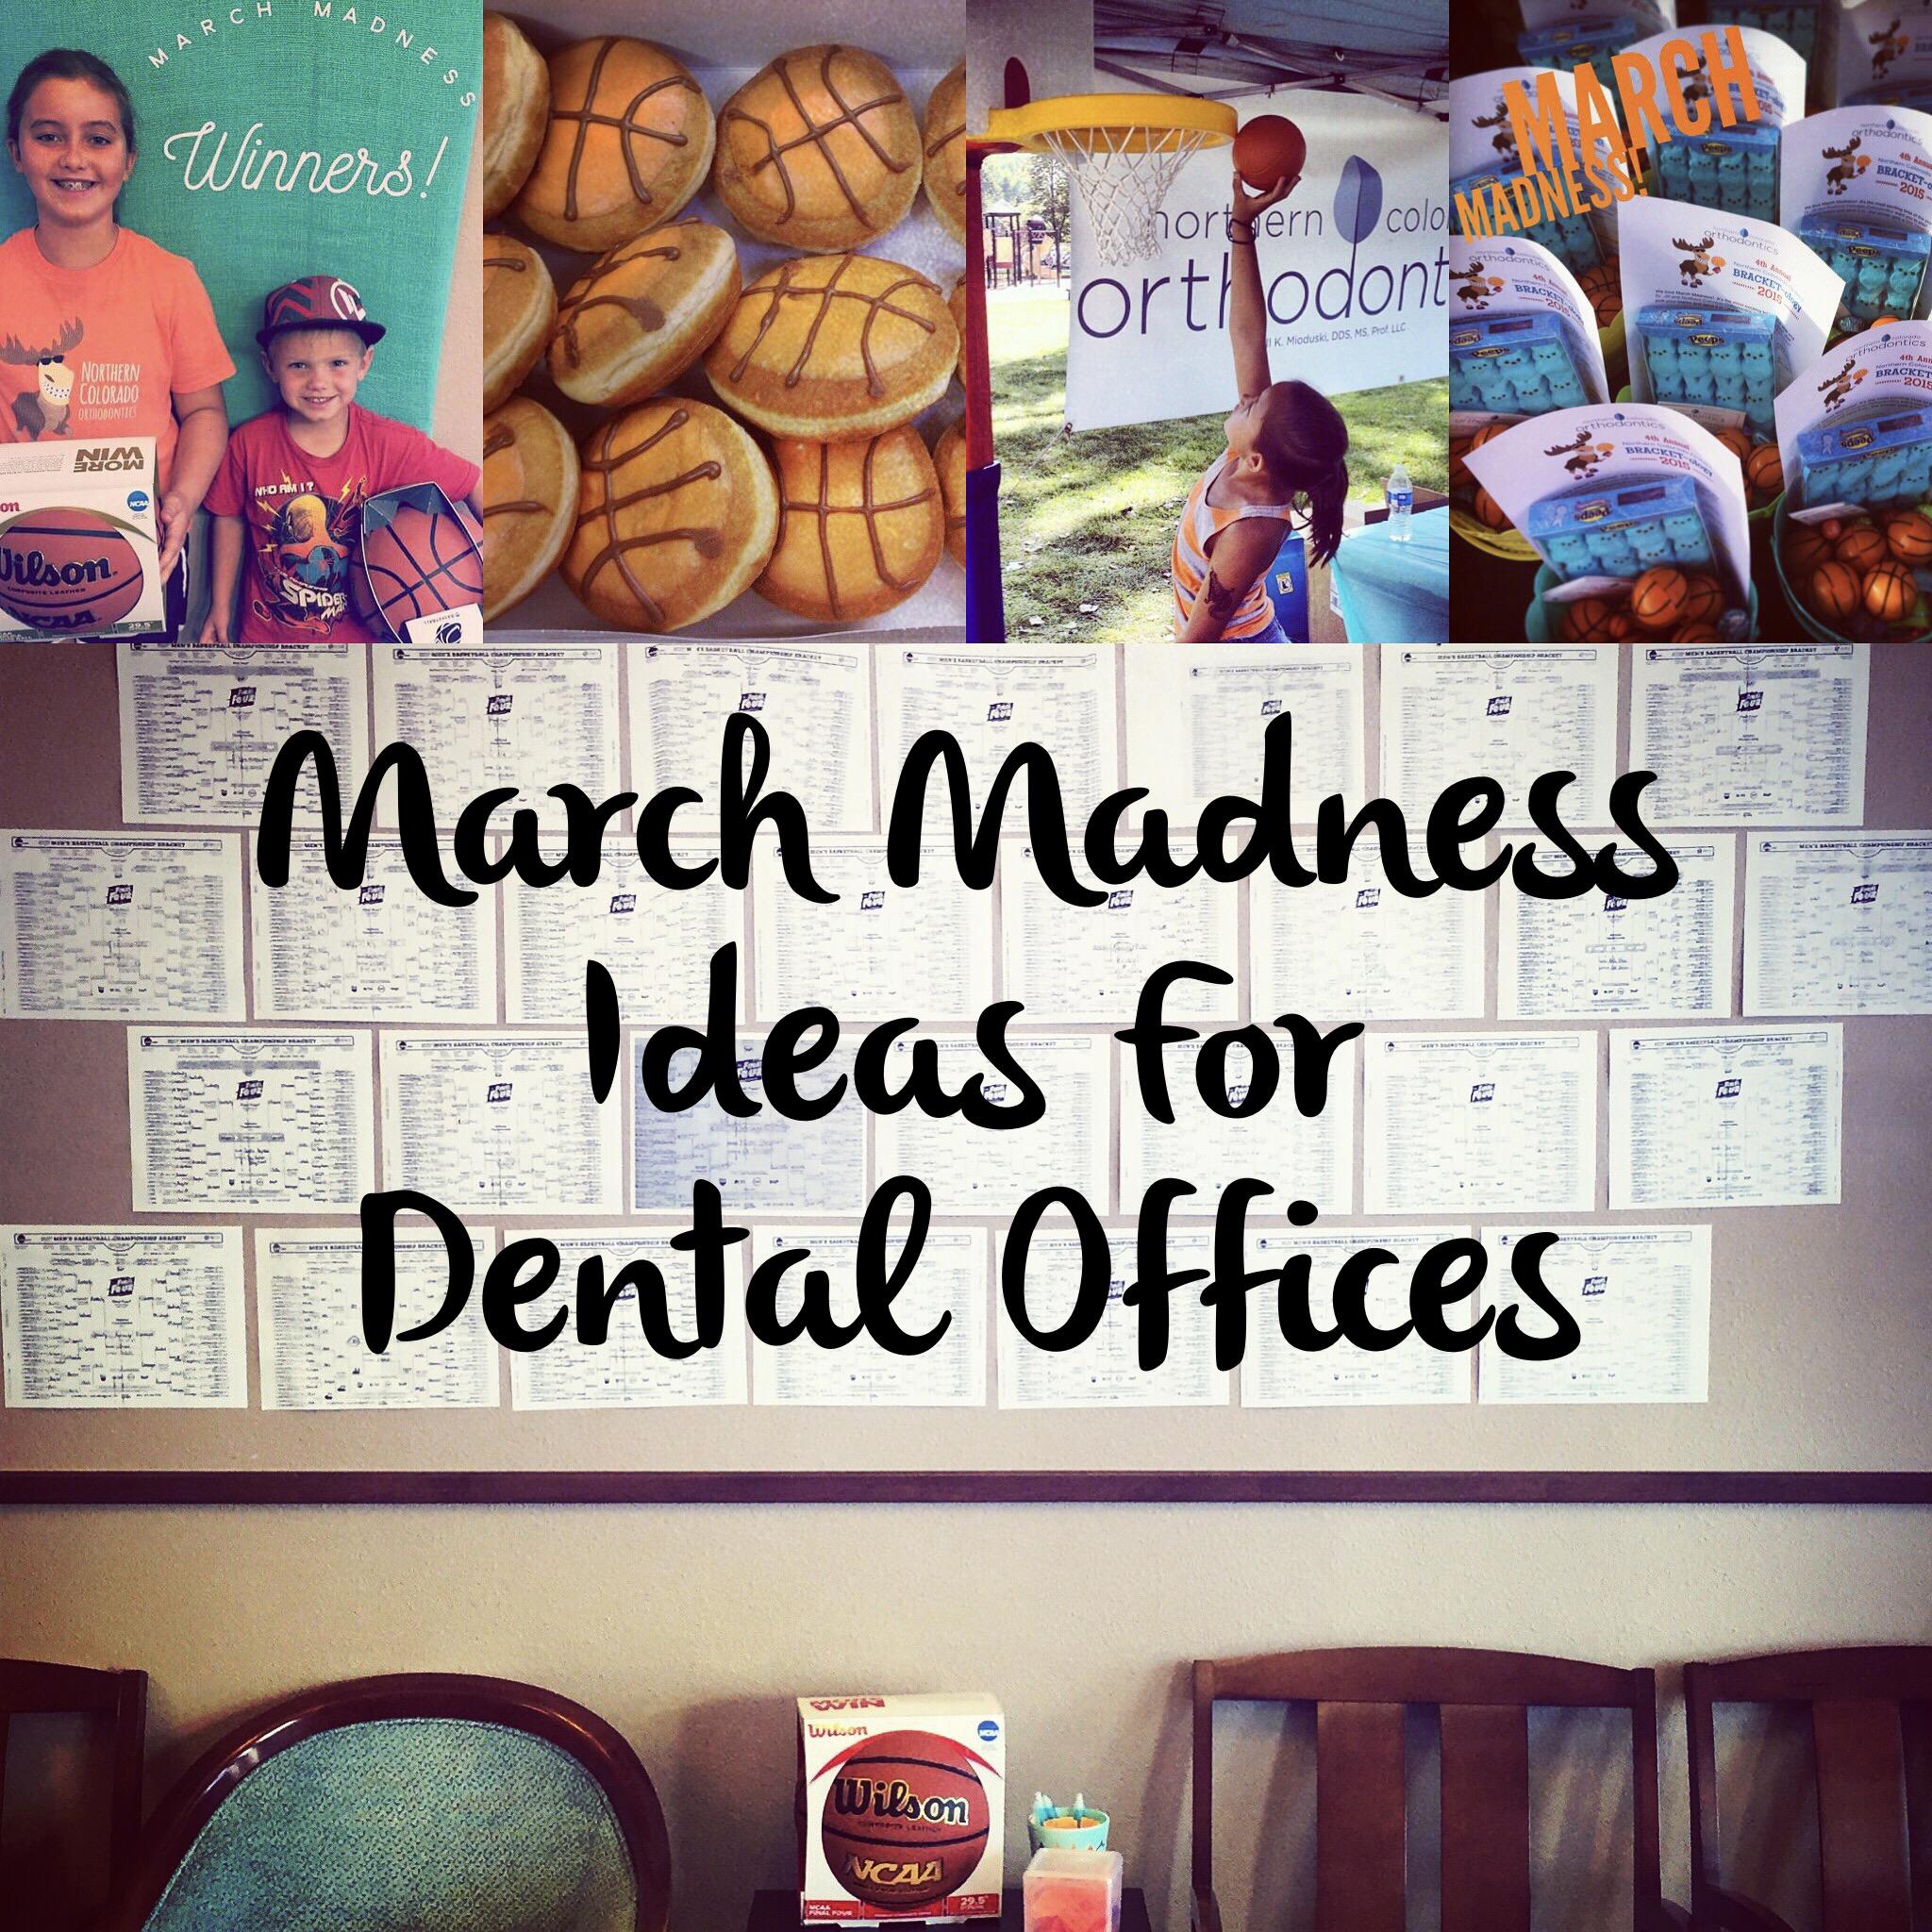 Dental office giveaway ideas